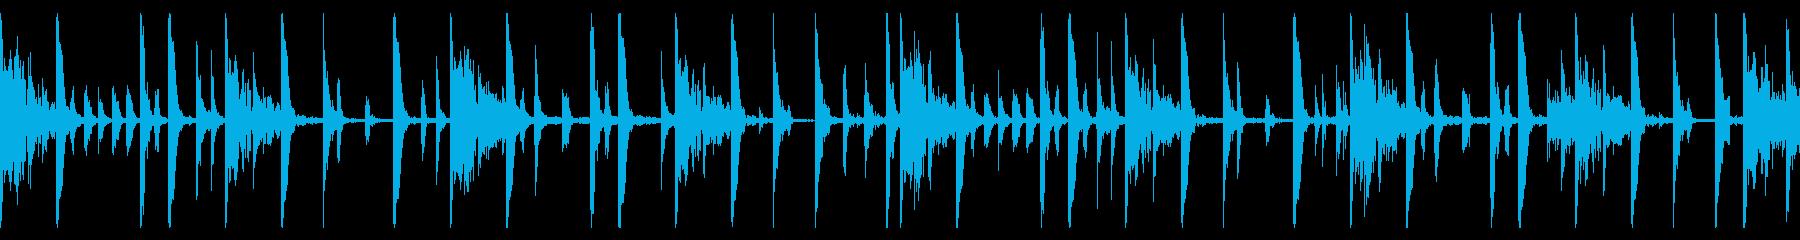 115 BPMの再生済みの波形